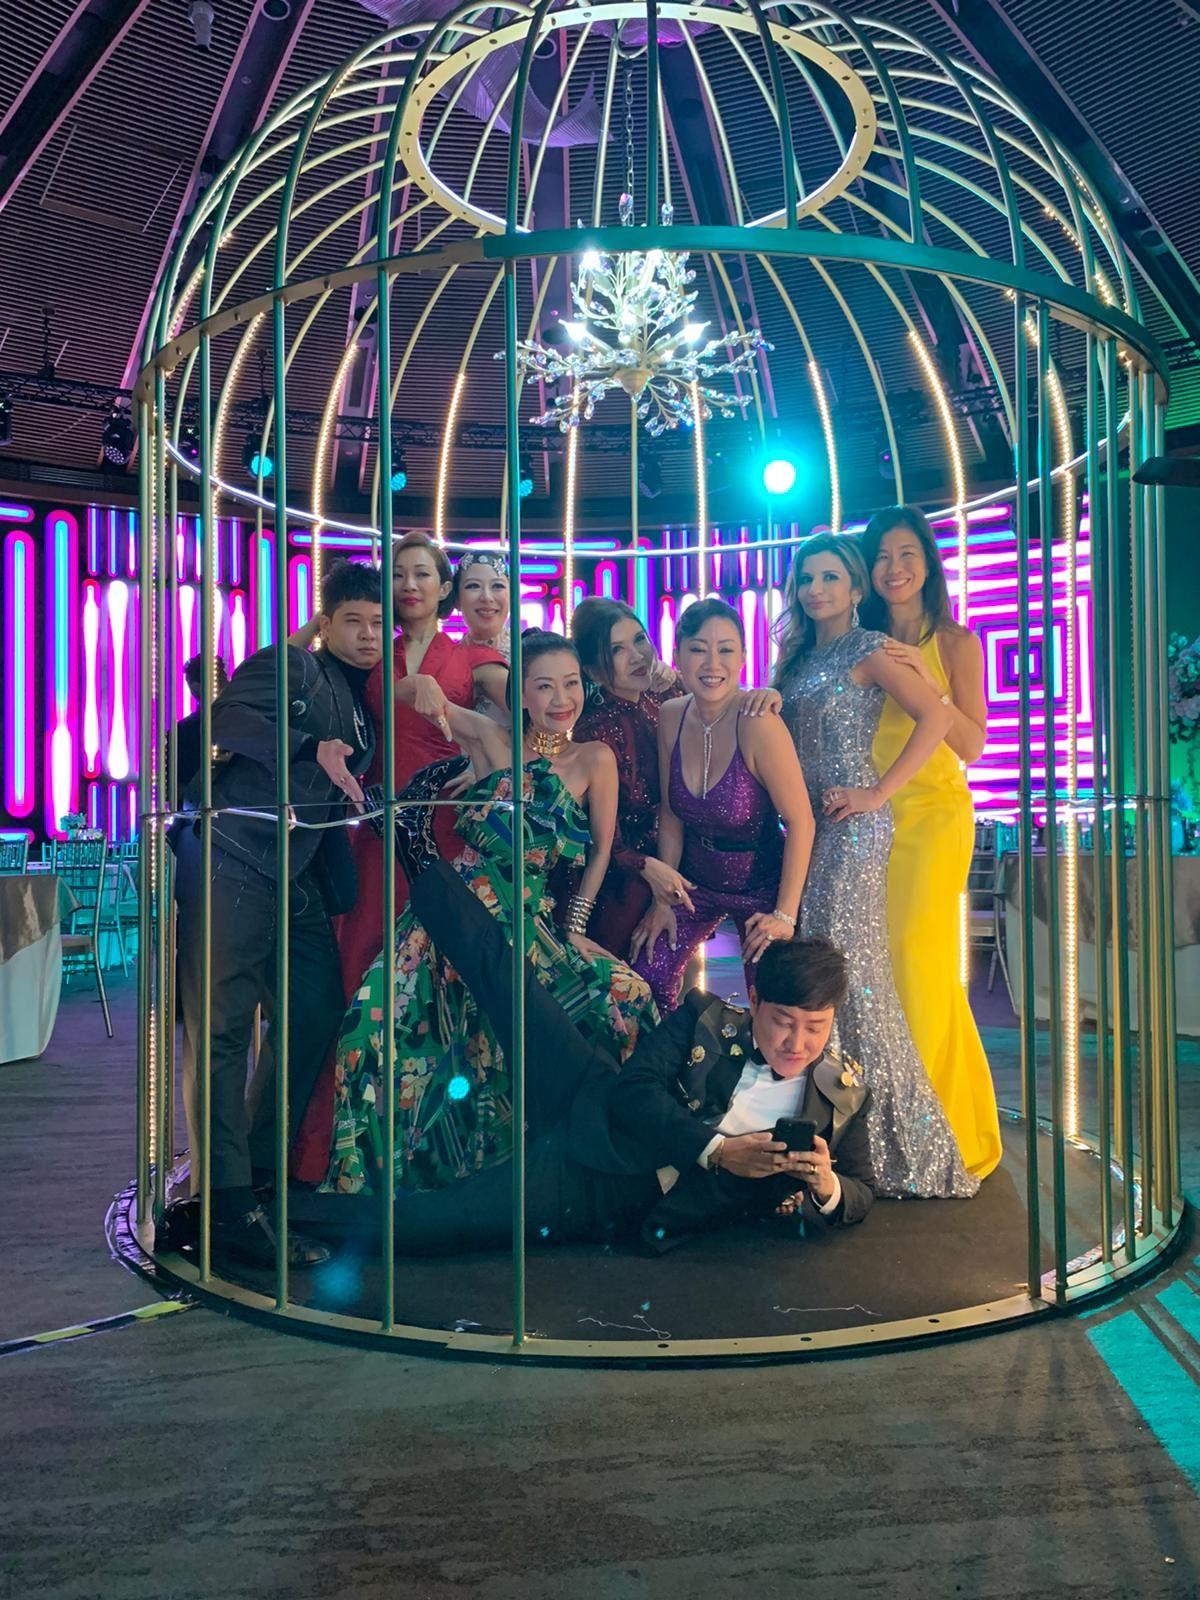 #Tatlergram: The Singapore Tatler Ball 2019